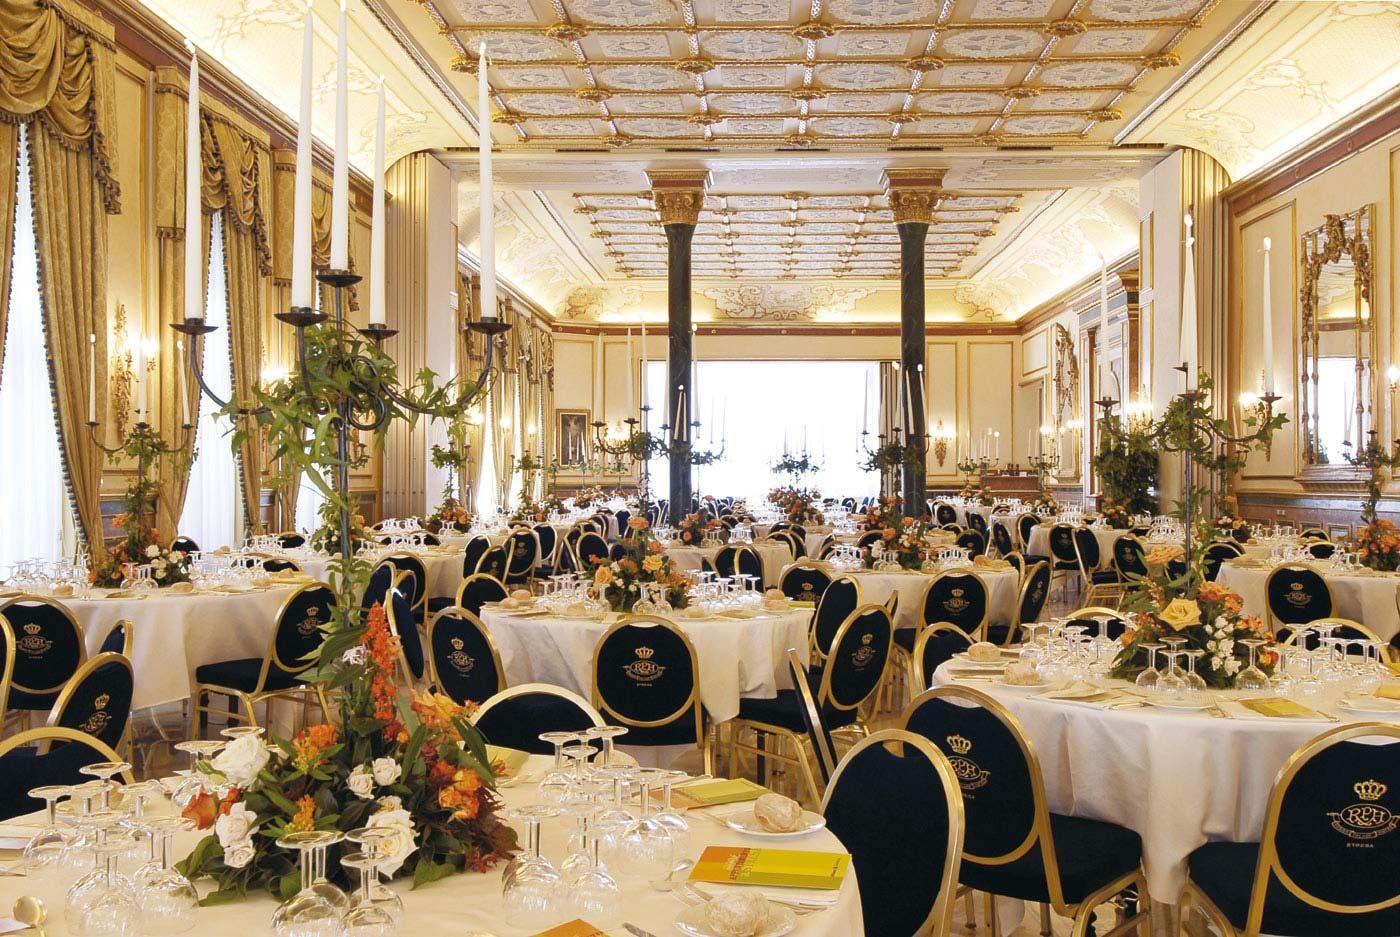 Regina Palace Hotel Stresa Liberty All Aperto Buone Vacanze Hotel